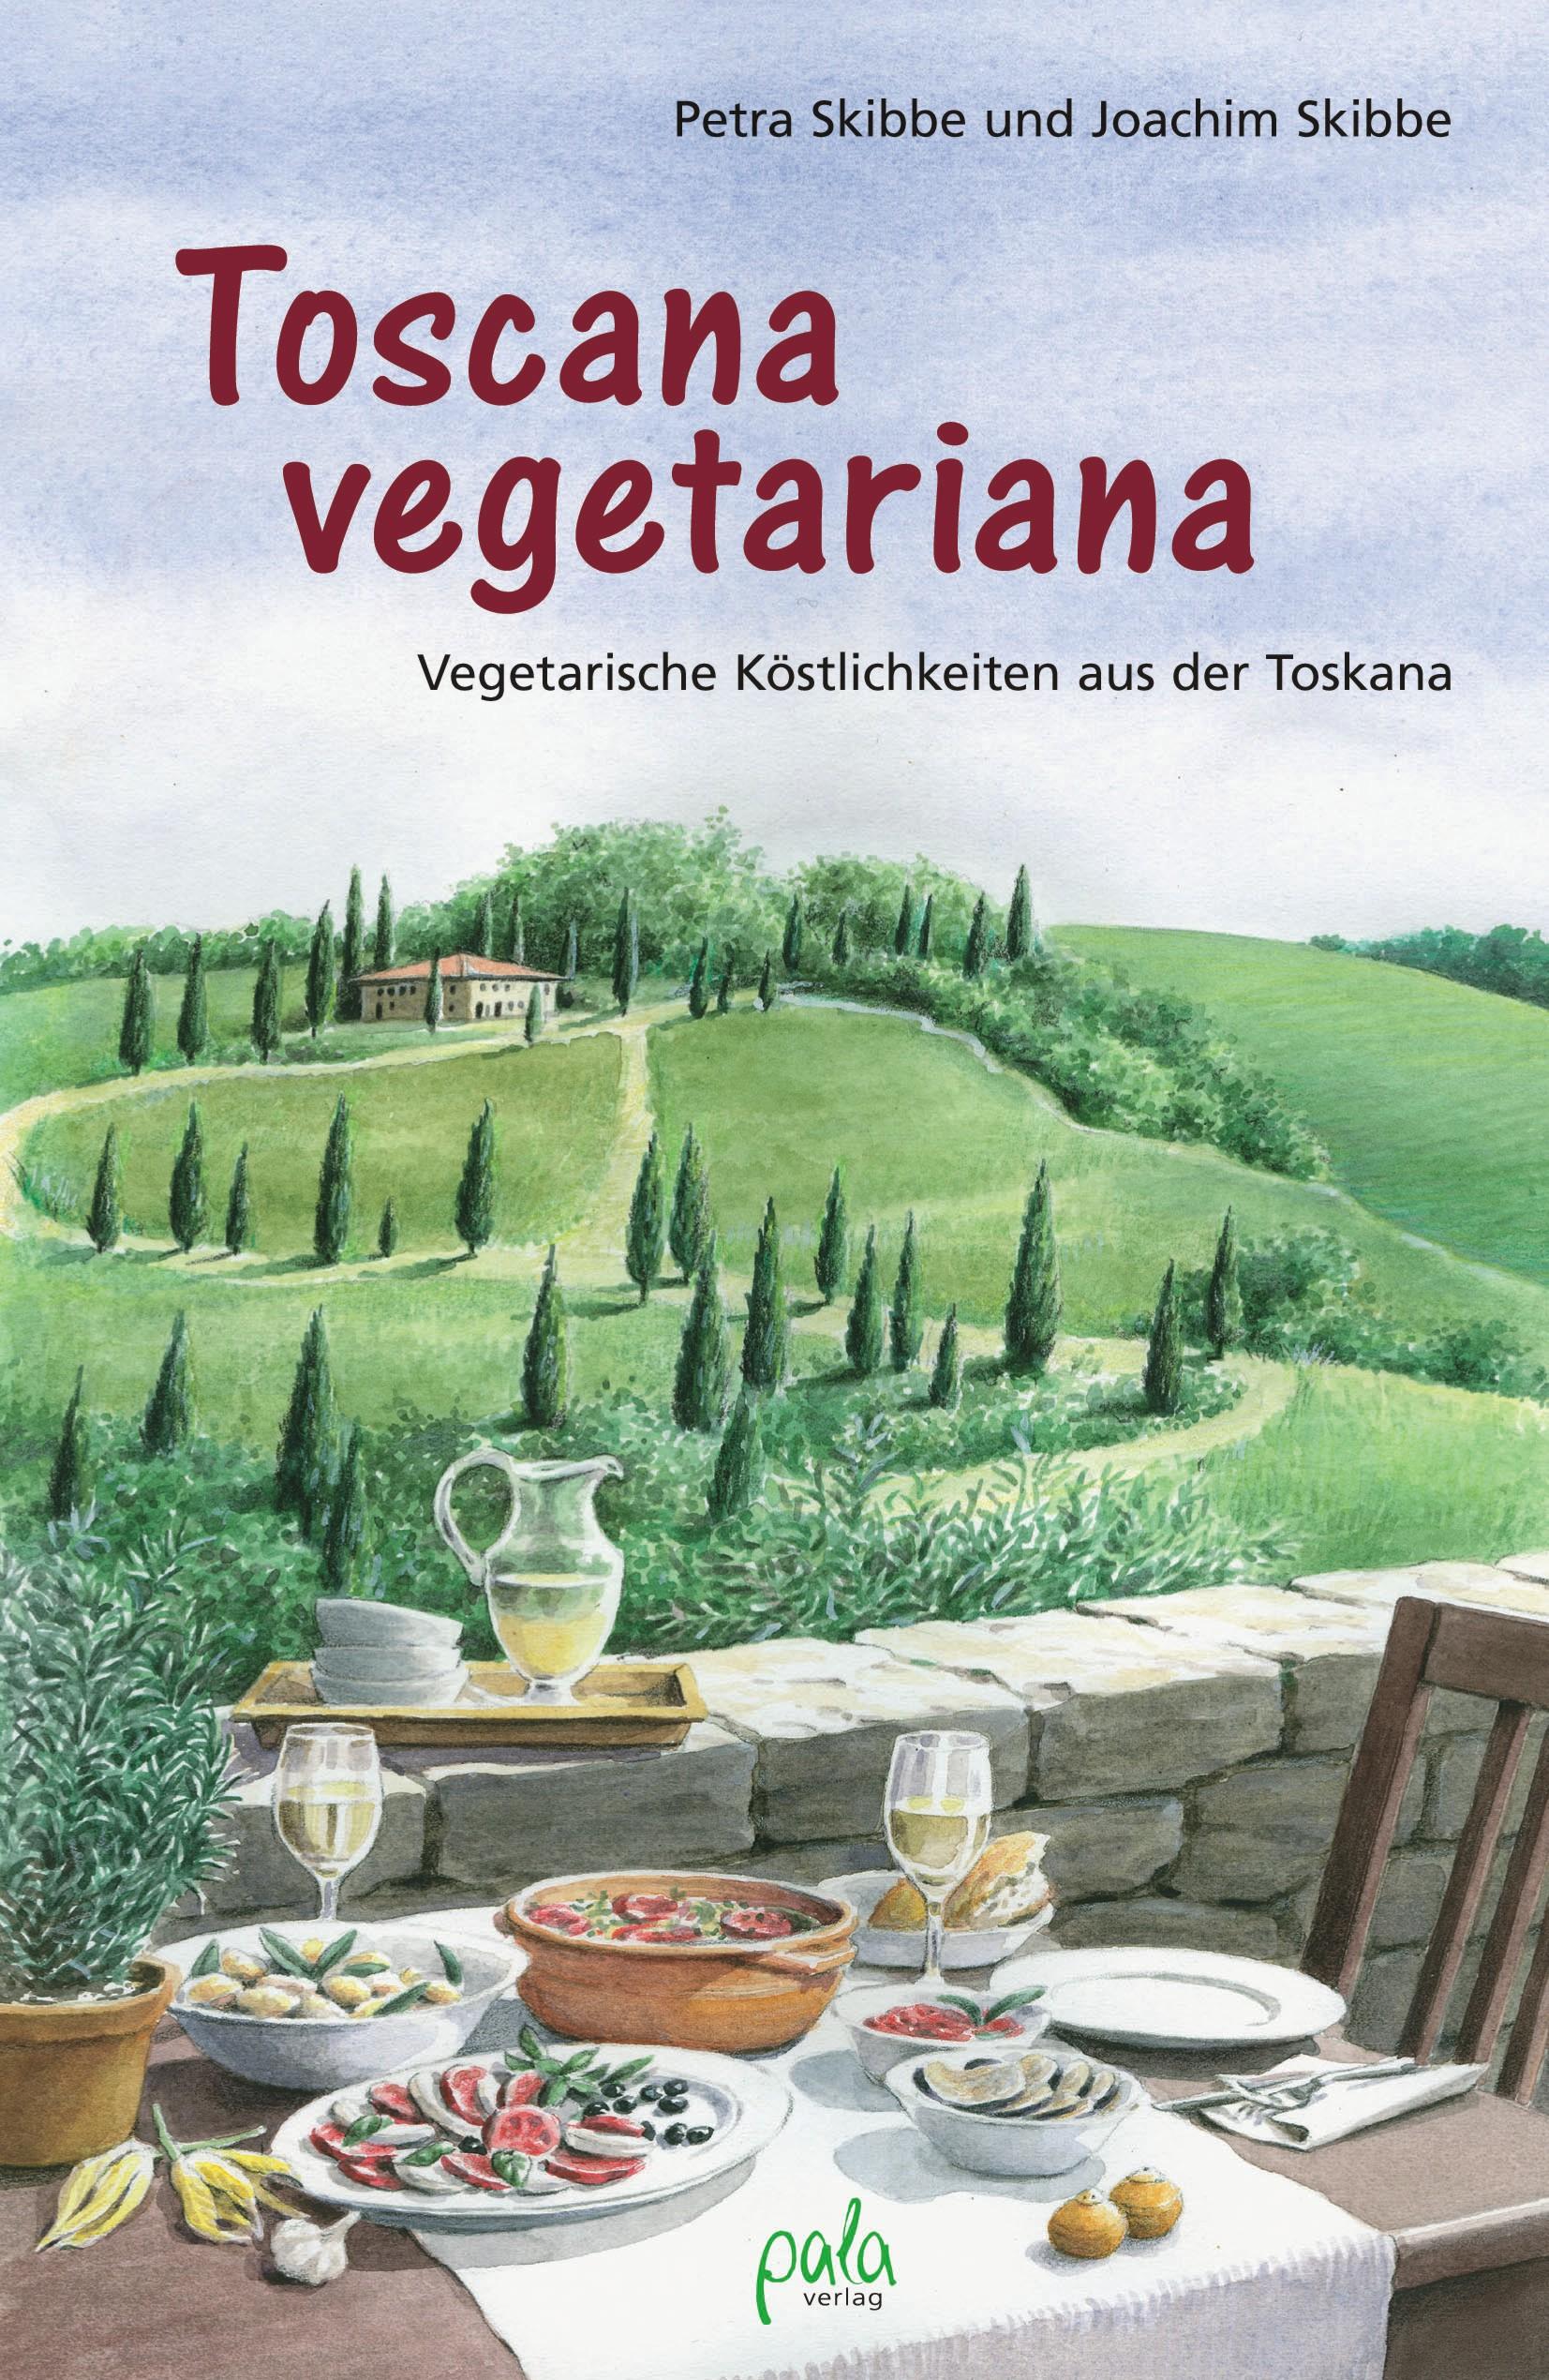 9783895662782 Toscana vegetariana